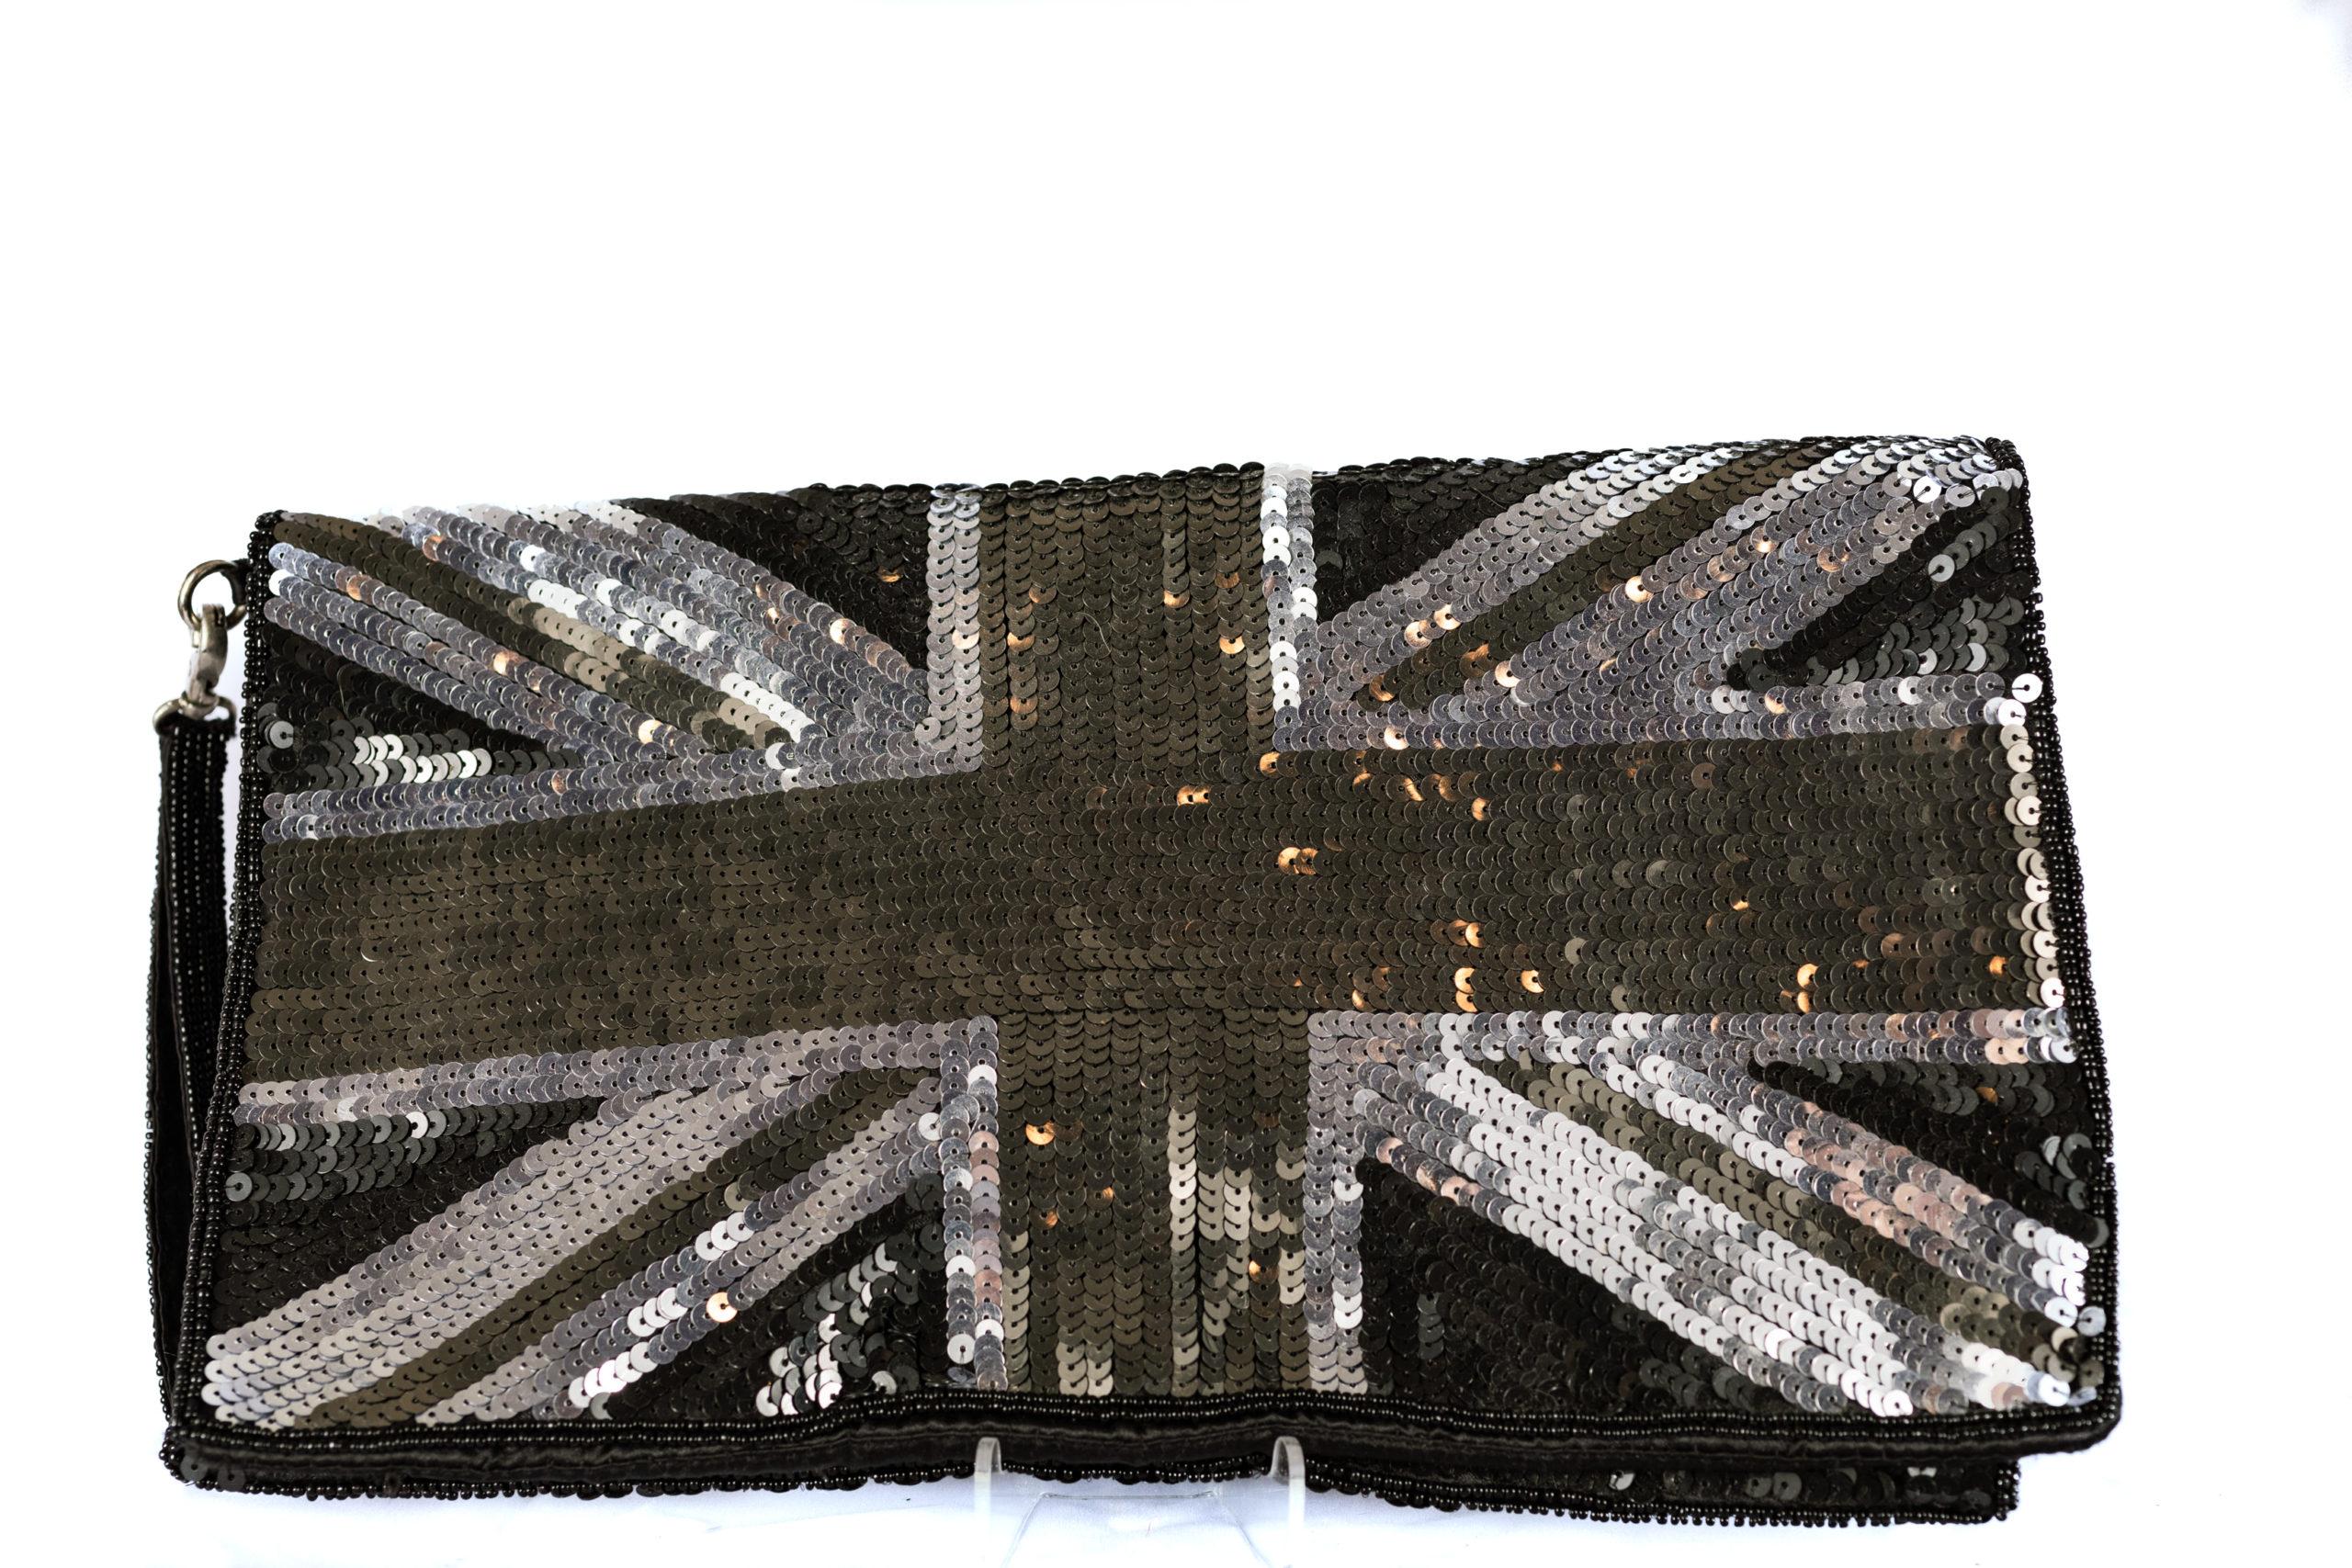 Union Jack purse